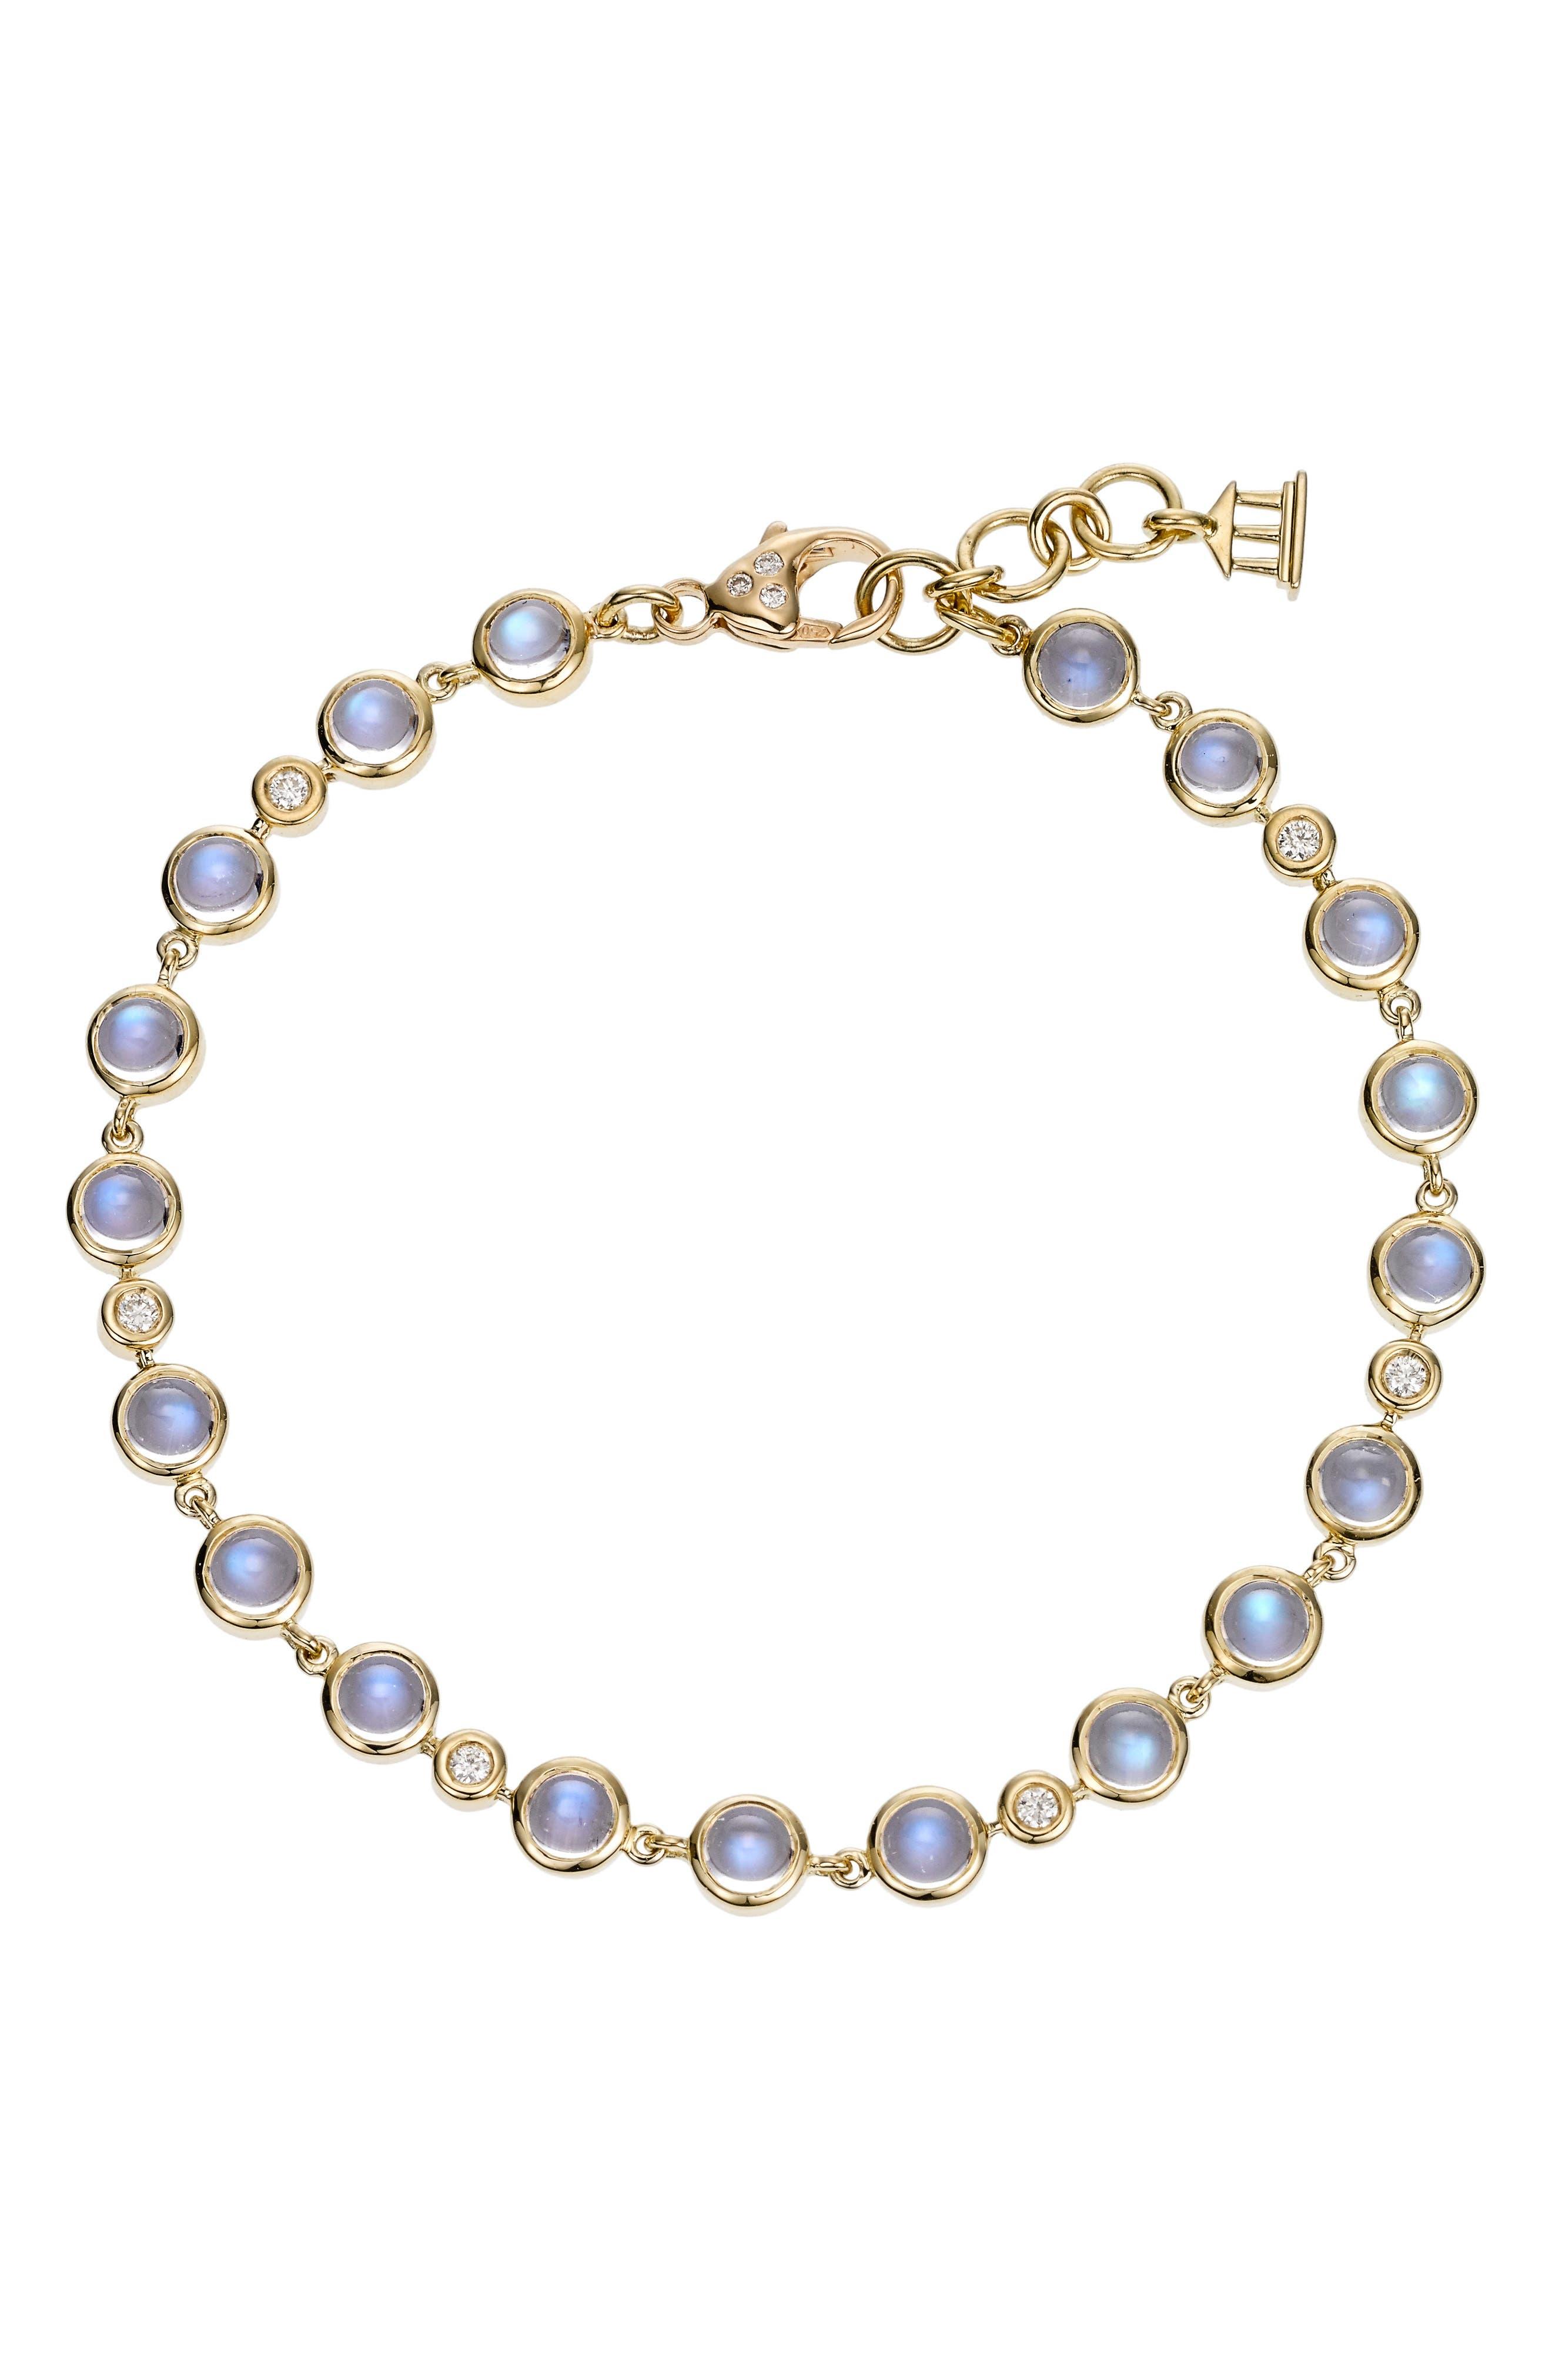 Main Image - Temple St. Clair Diamond & Moonstone Bracelet